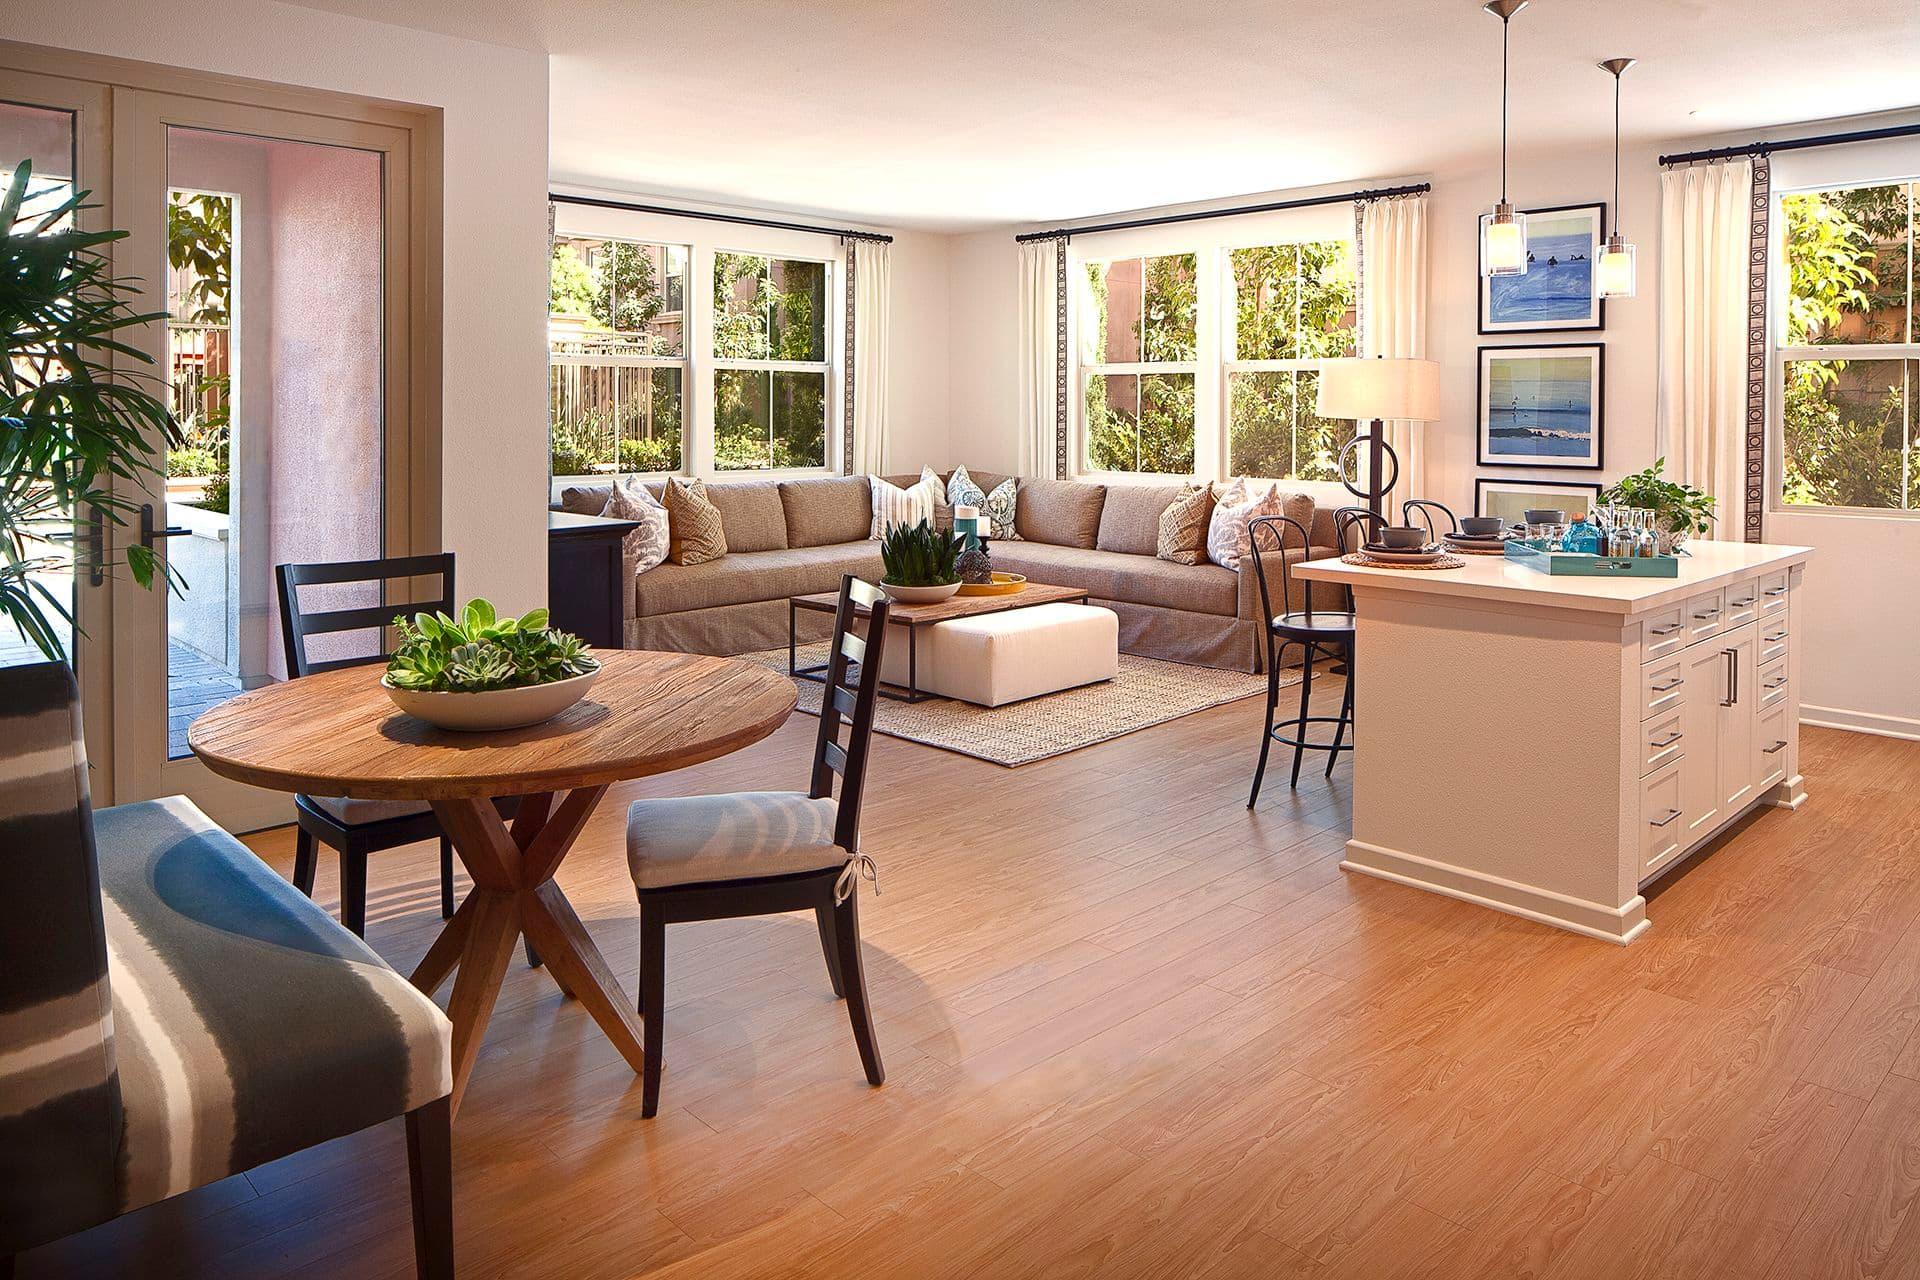 Interior view of a living room at Monticello Apartment Homes in Santa Clara, CA.